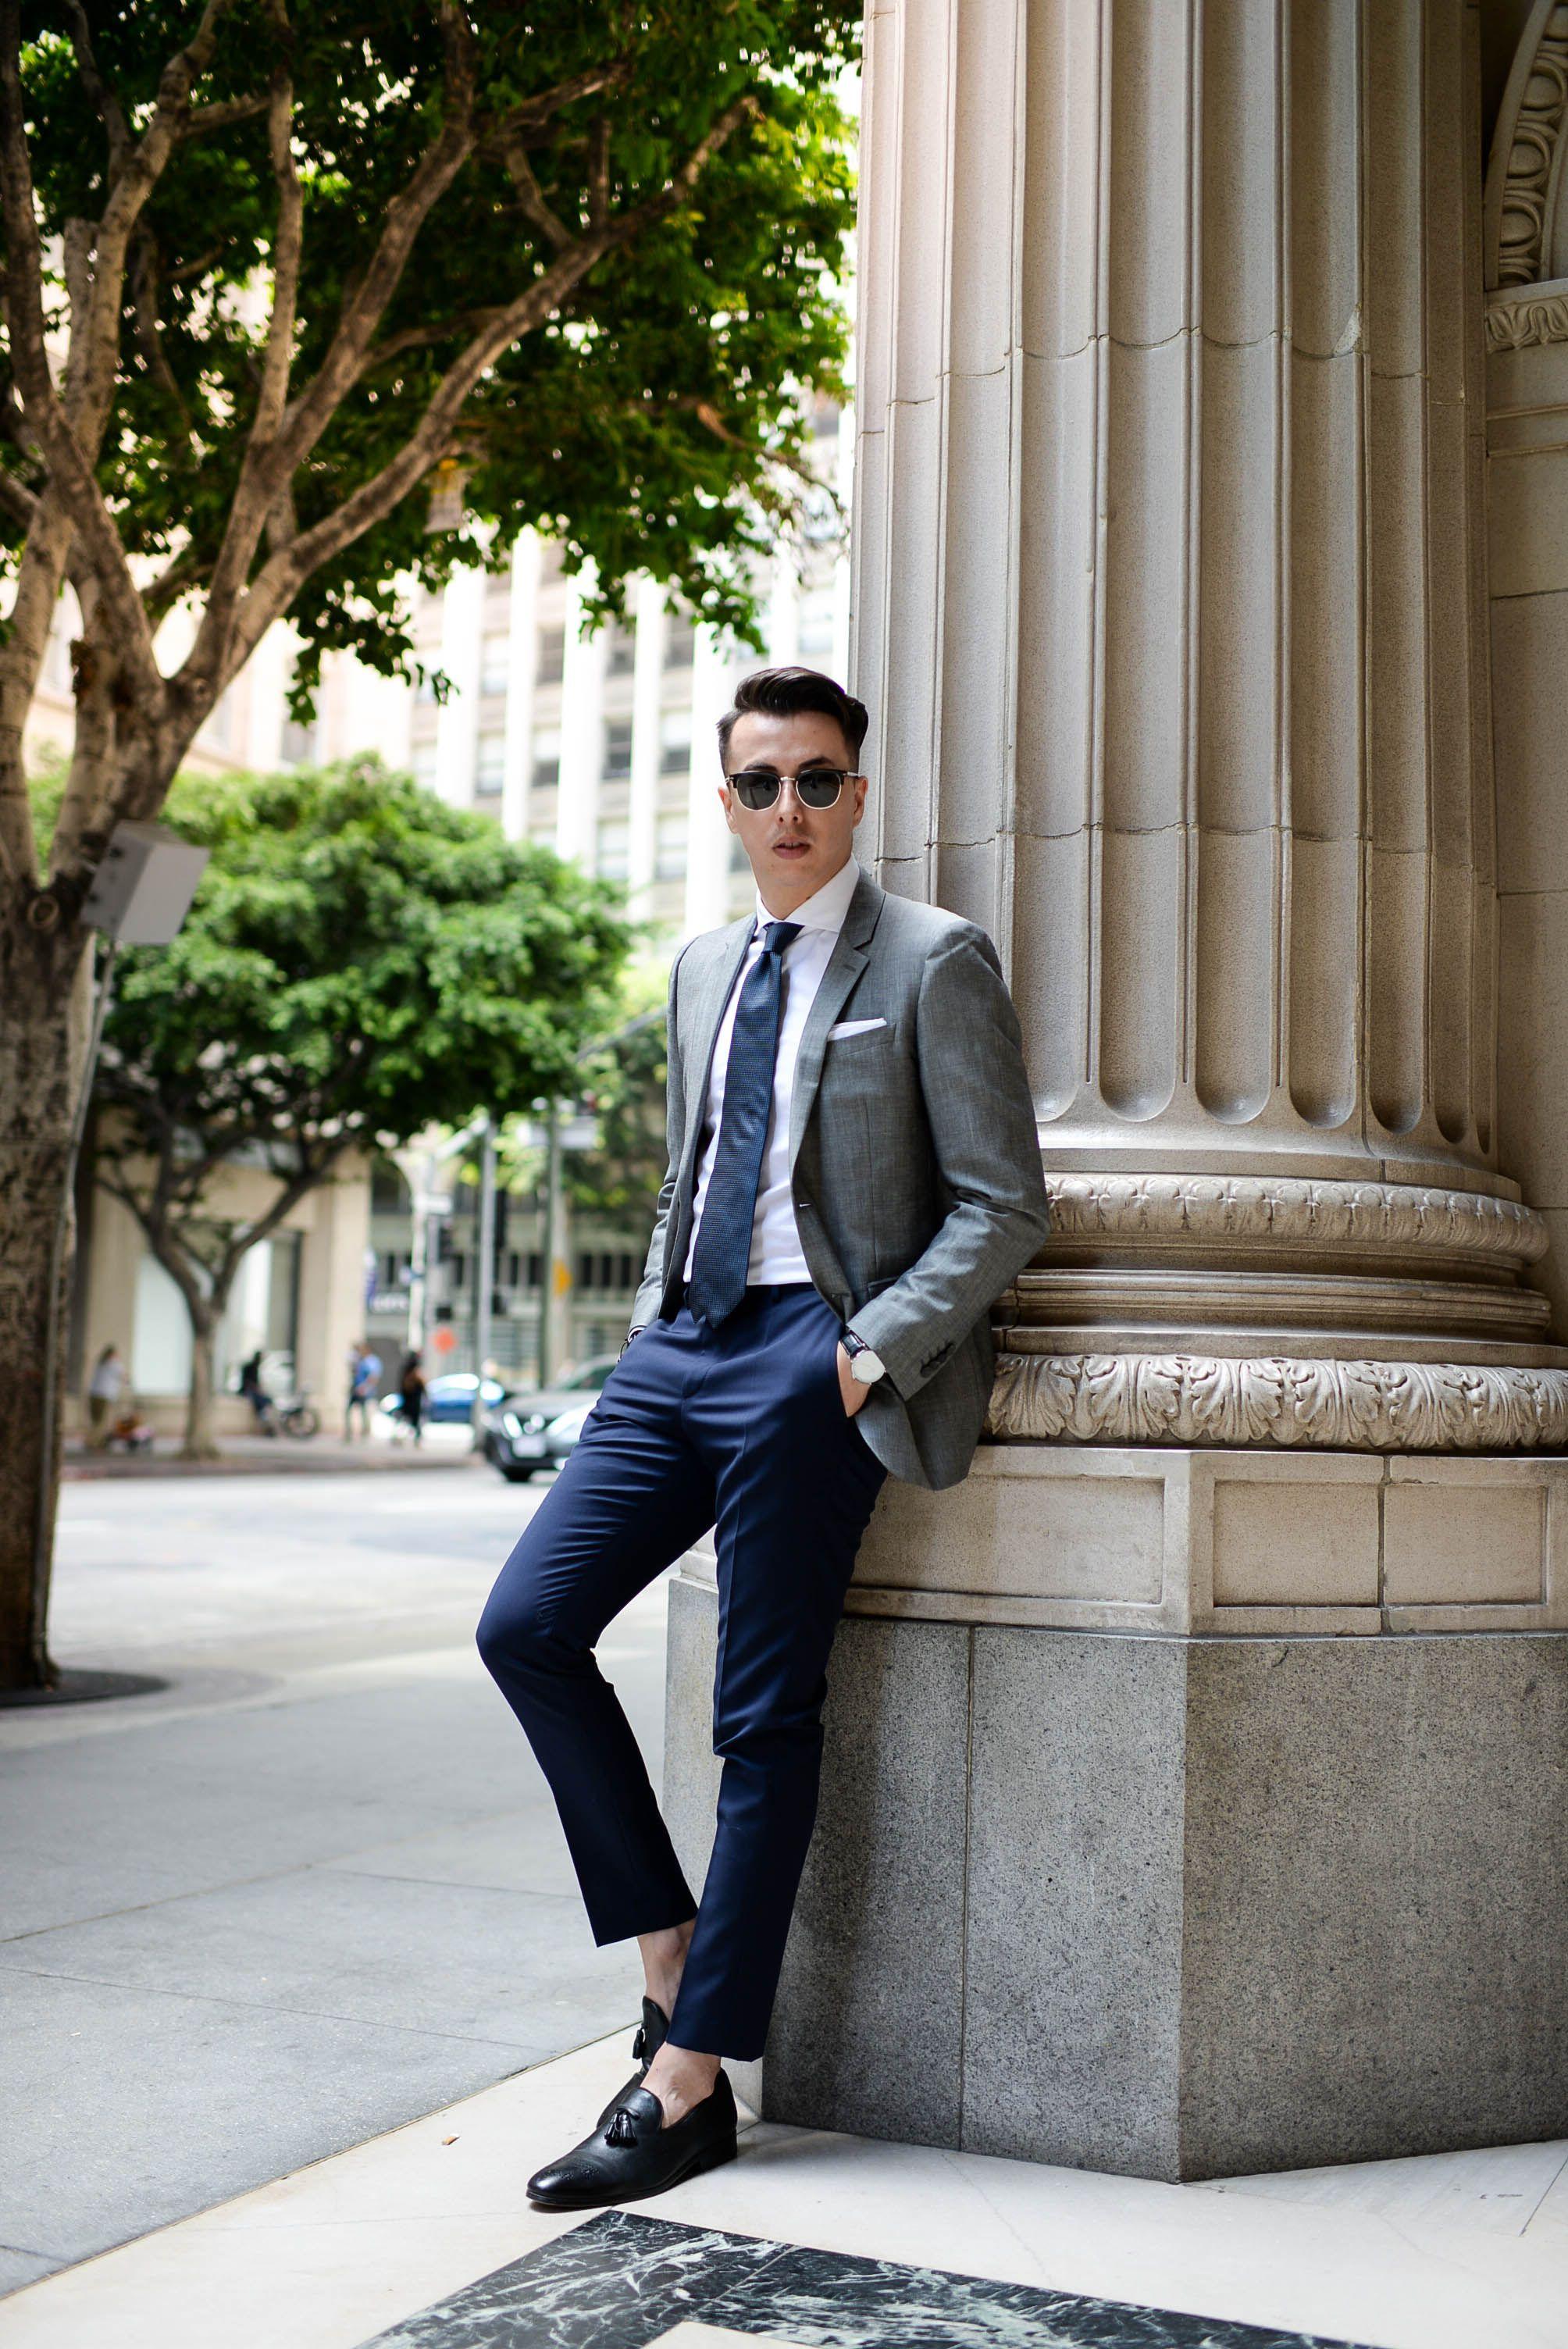 3f1329db120 Gray blazer + navy tie + white dress shirt + navy pants + black loafers